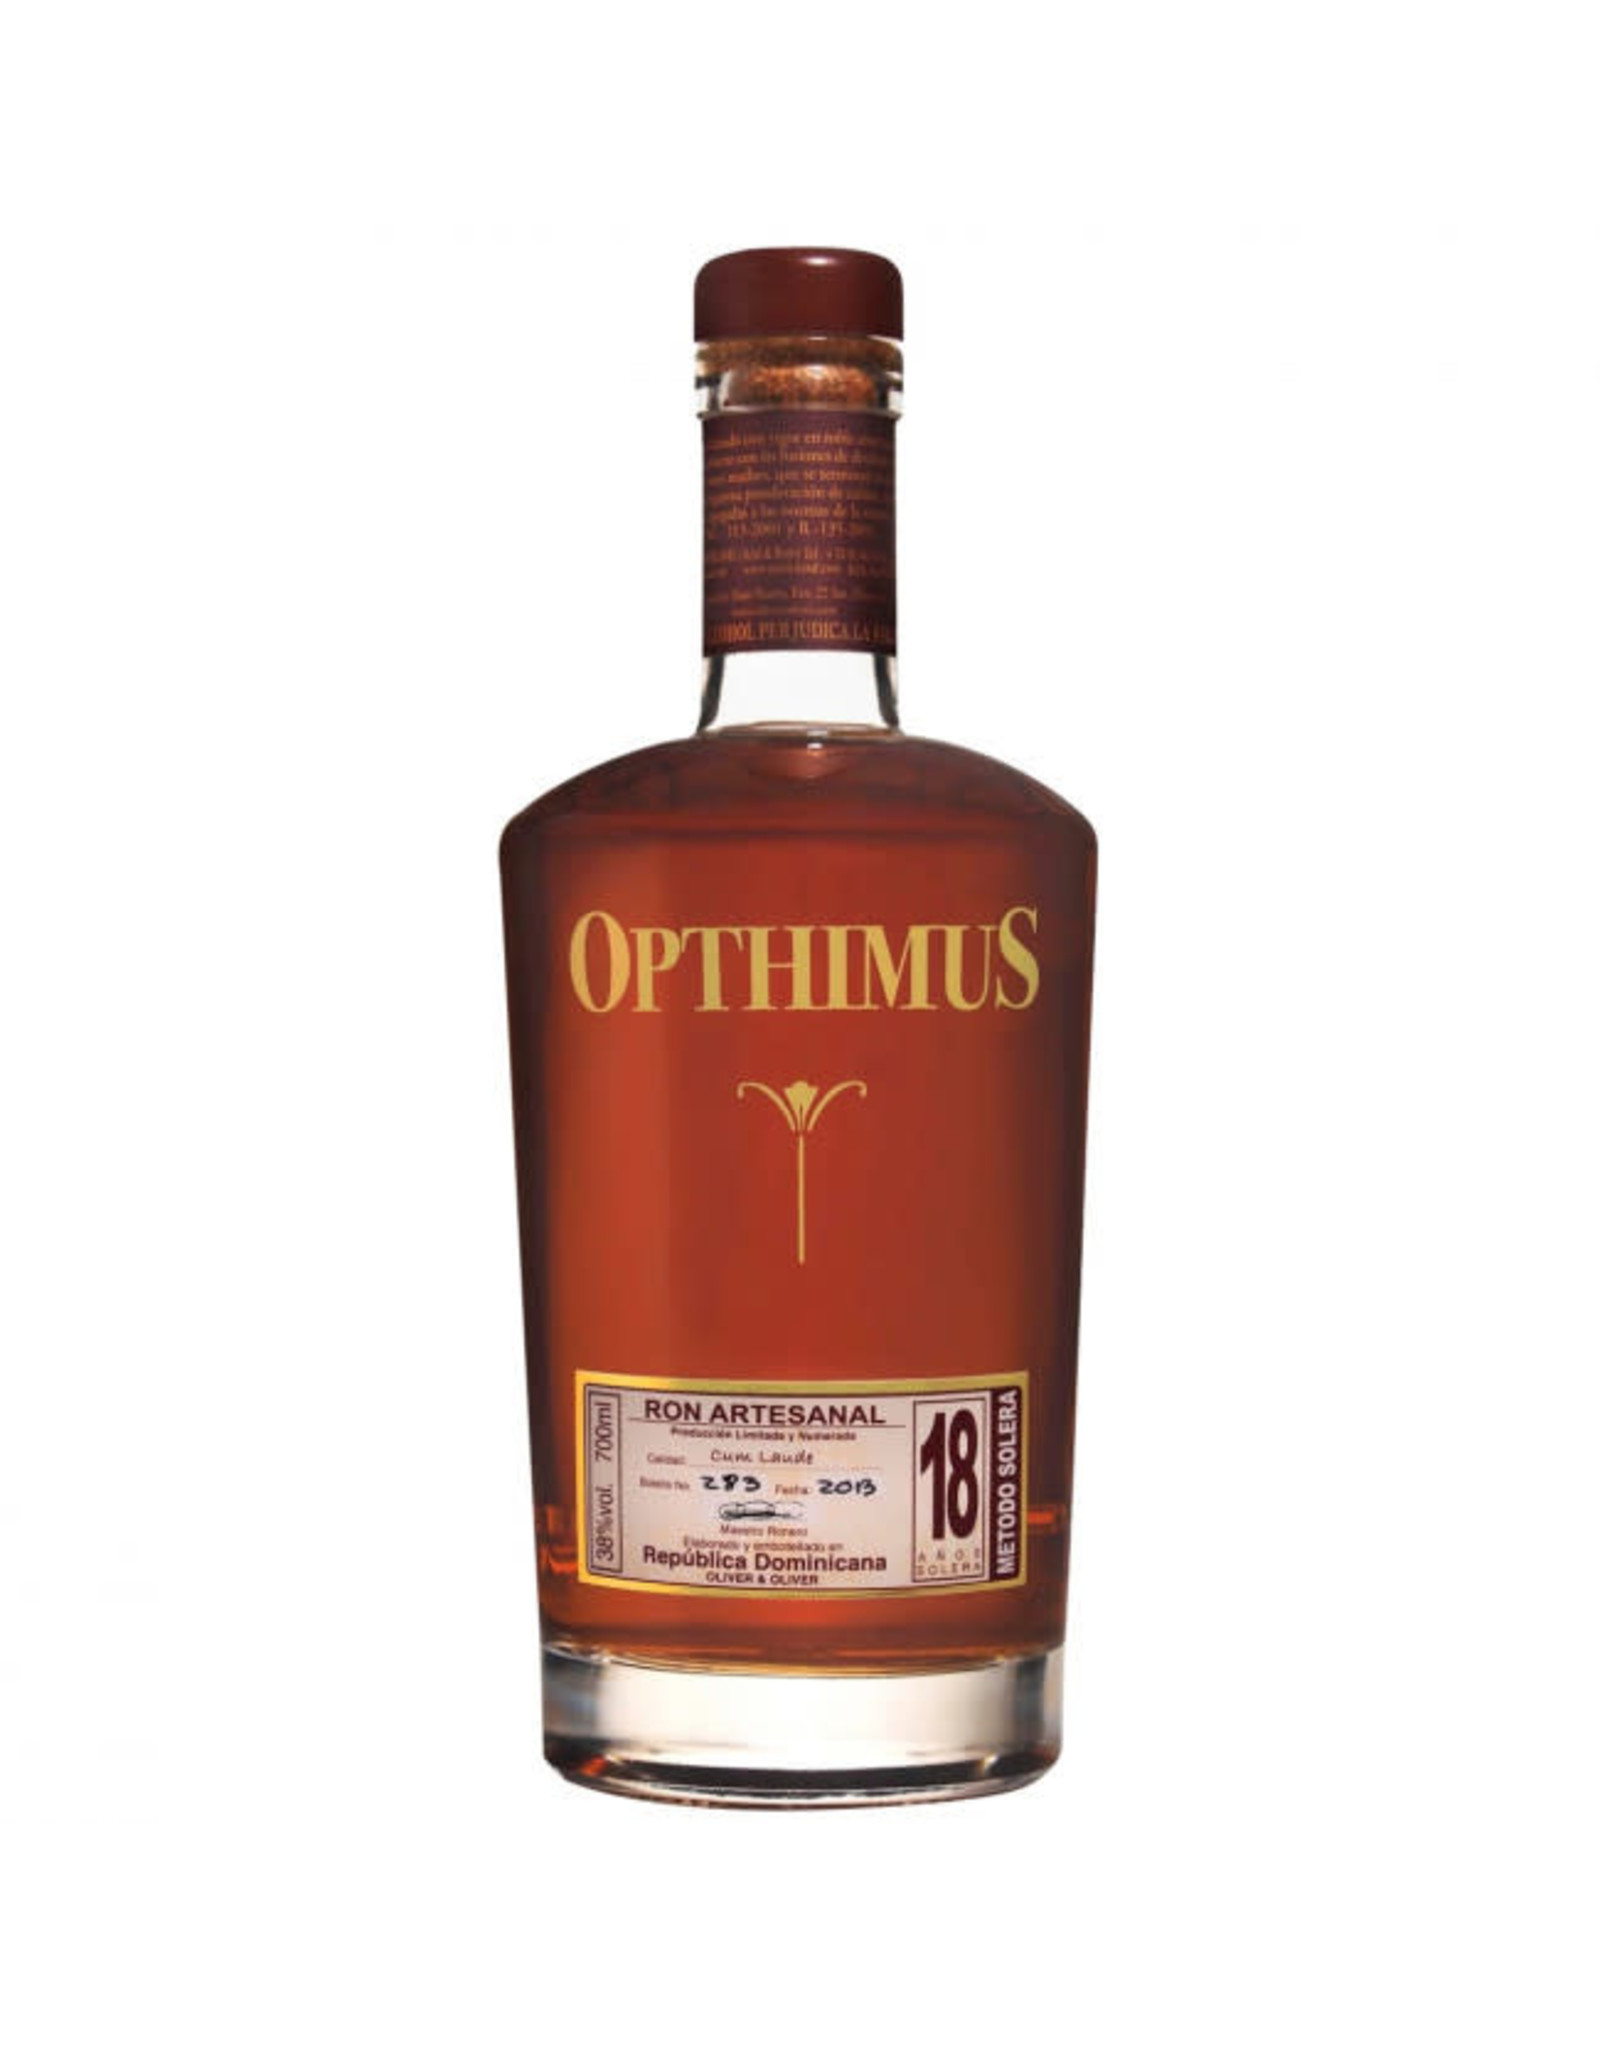 Opthimus Rum 18 year